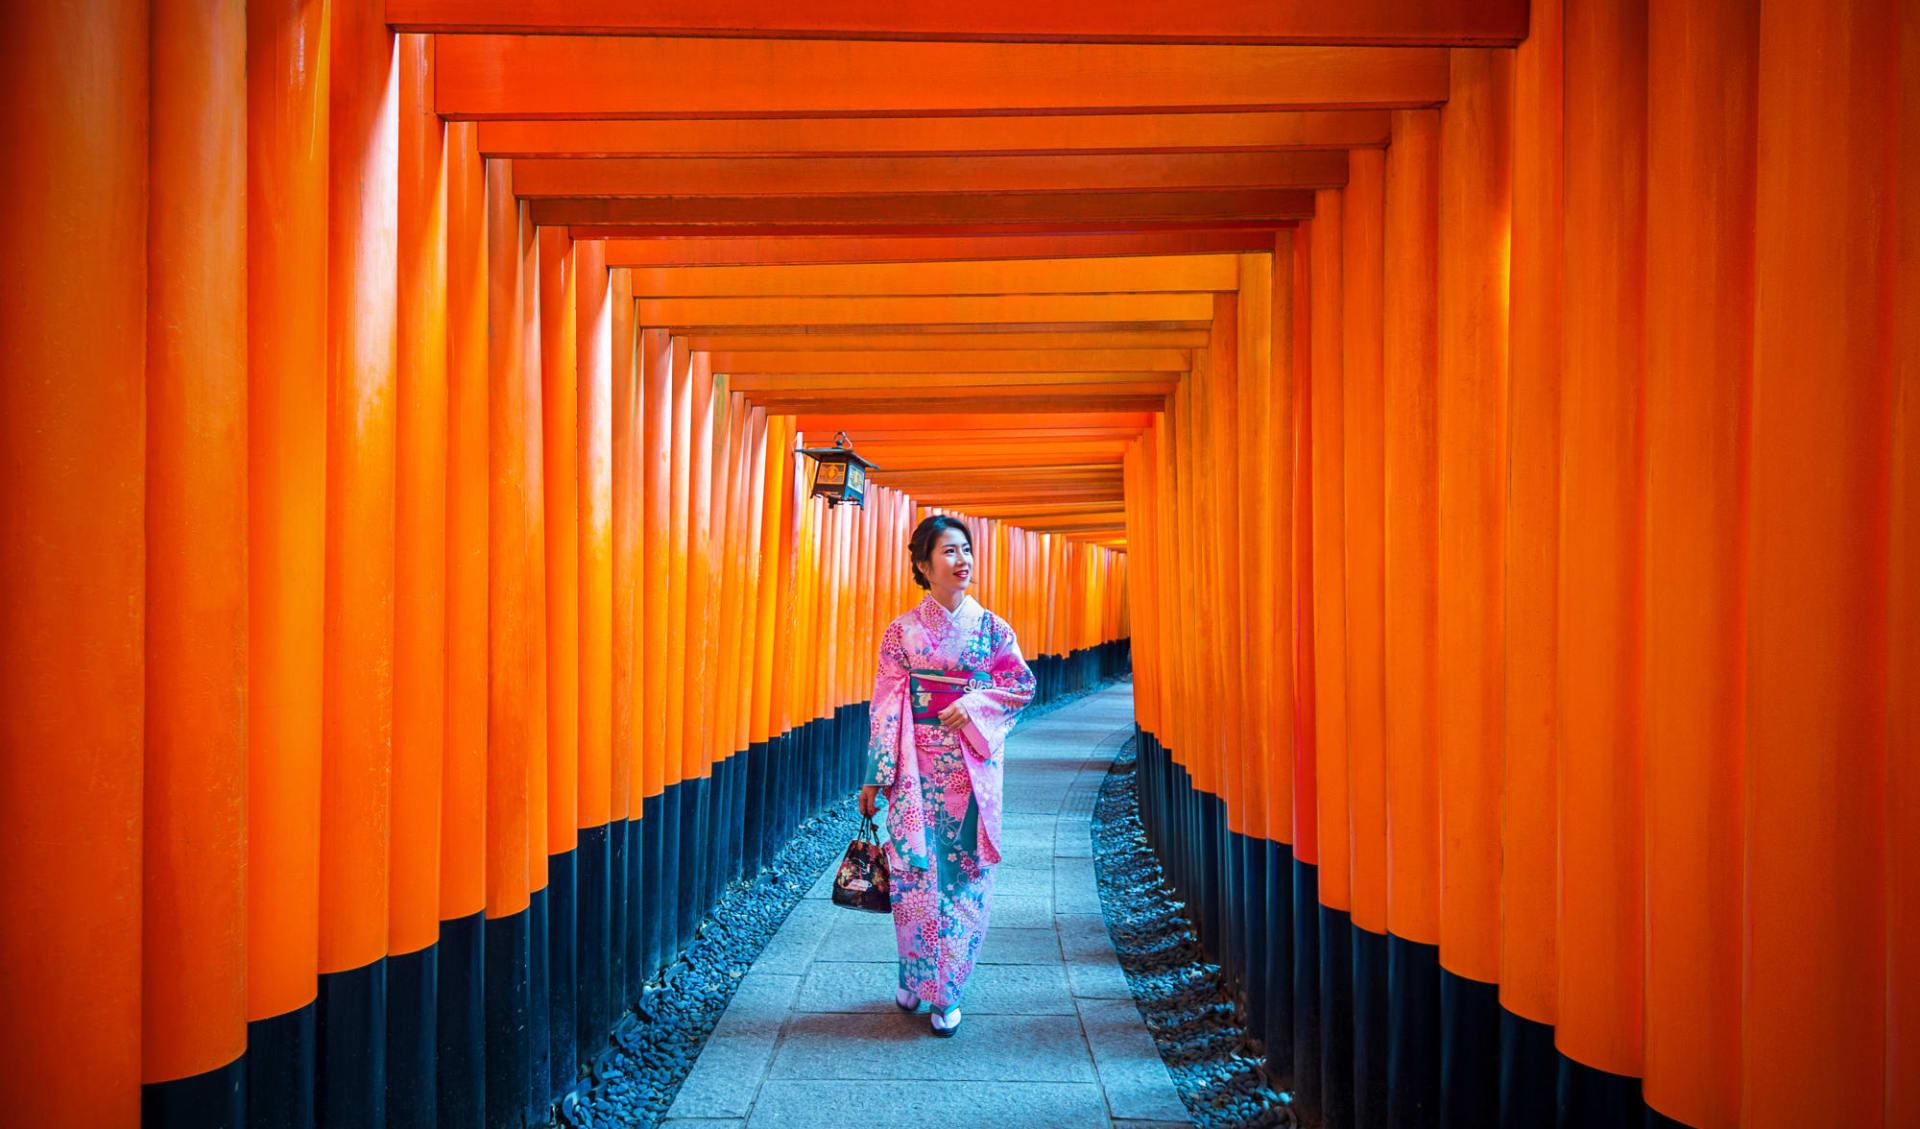 Höhepunkte Japans ab Tokio: Kyoto Fushimi Inari Shrine with Woman in traditional Kimono